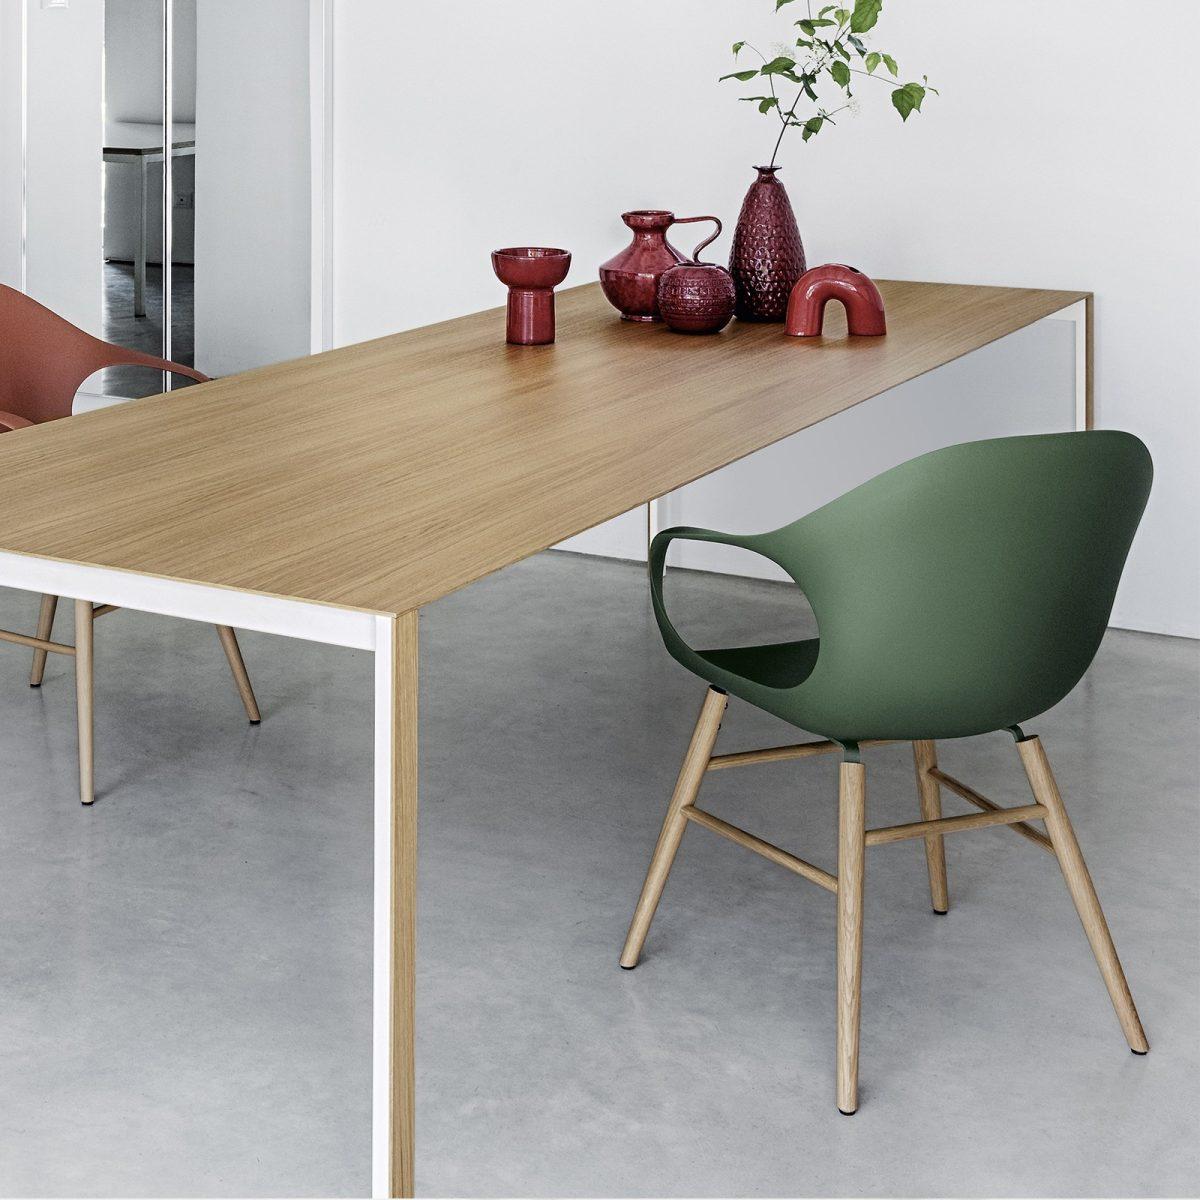 Möbel - Stühle - Elephant Wood Sessel - Kristalia - Buchenfurnier, lackiertes Polyurhethan